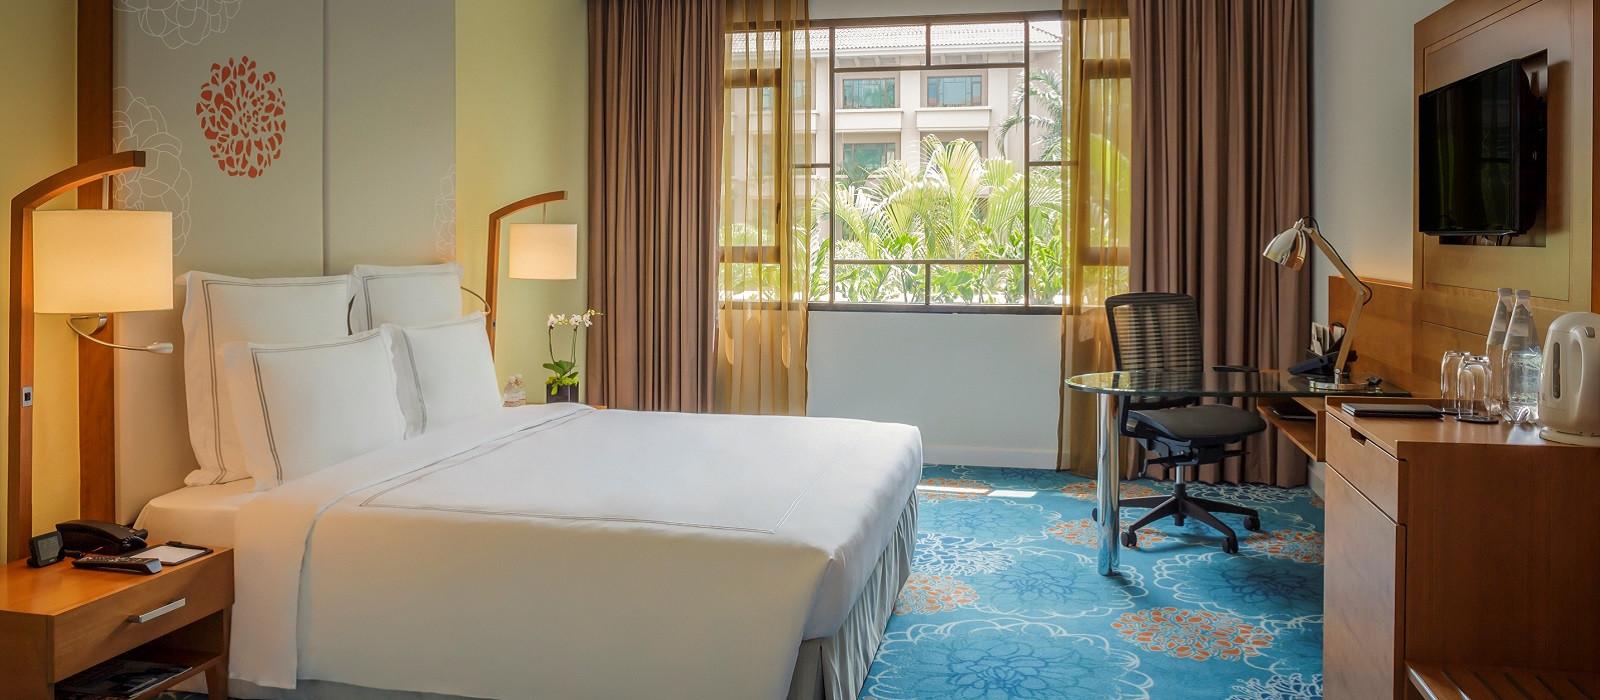 Hotel Swissotel Merchant Court Singapore